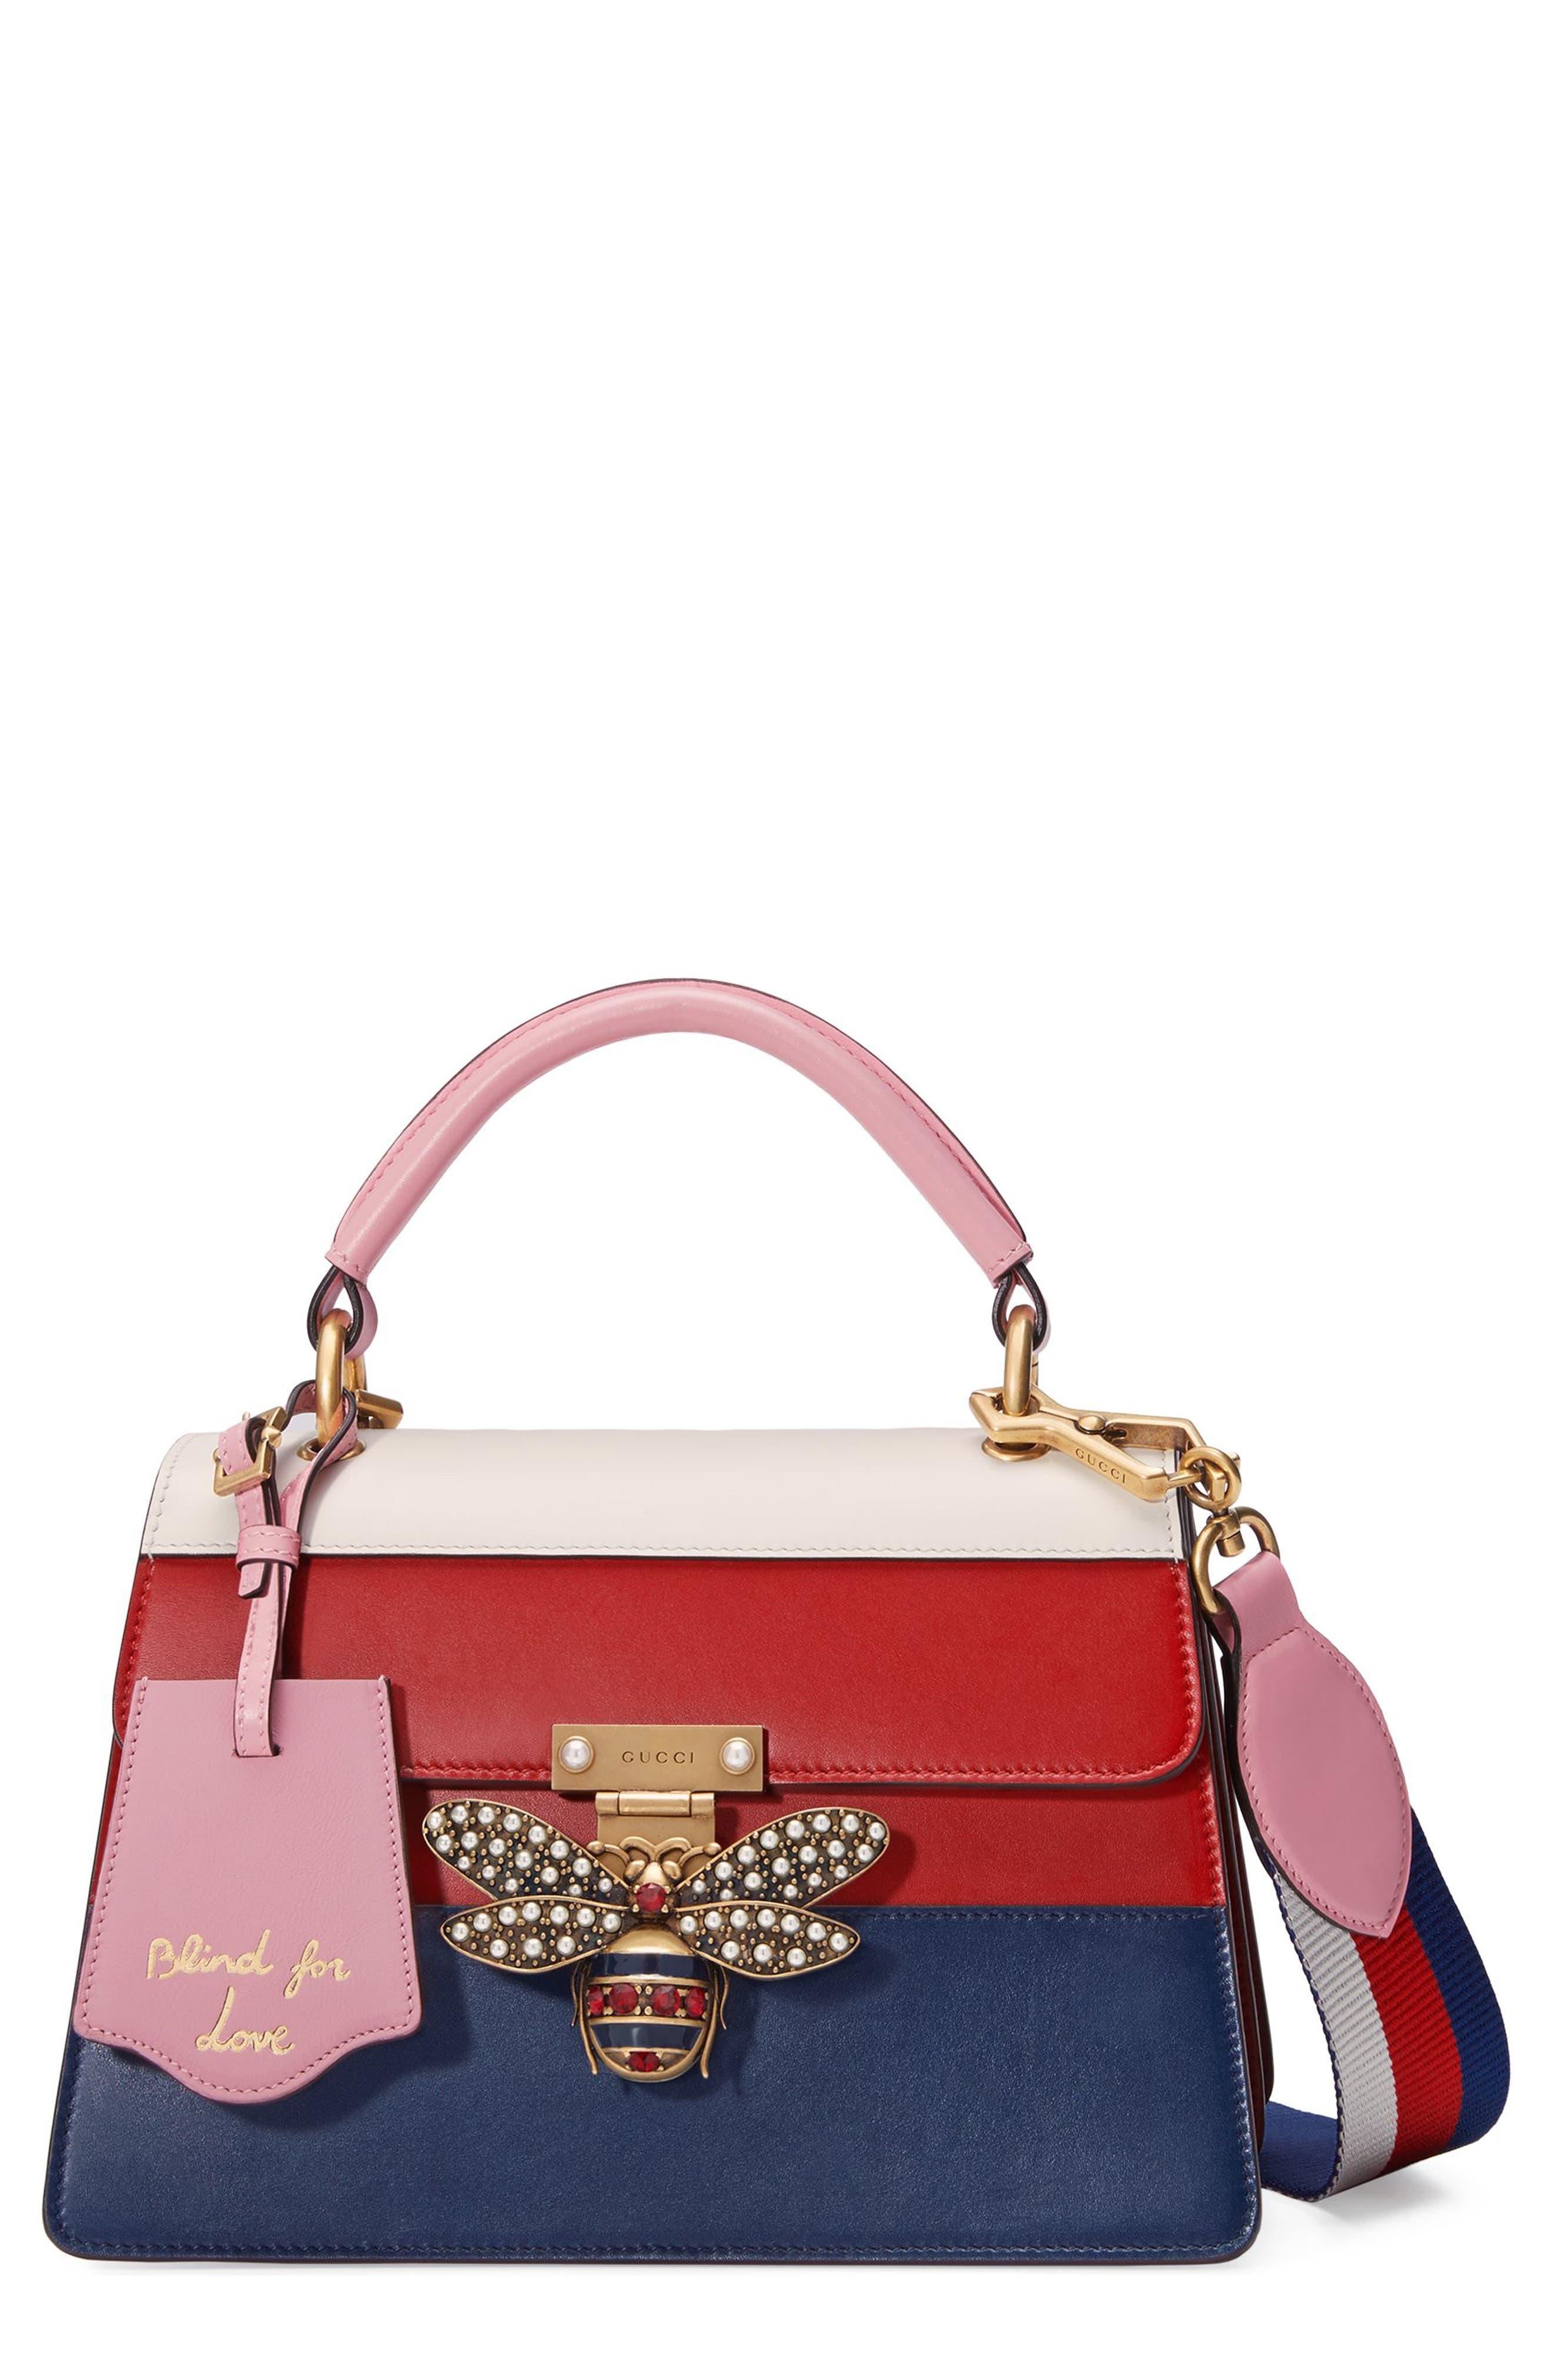 Alternate Image 1 Selected - Gucci Queen Margaret Top Handle Leather Satchel